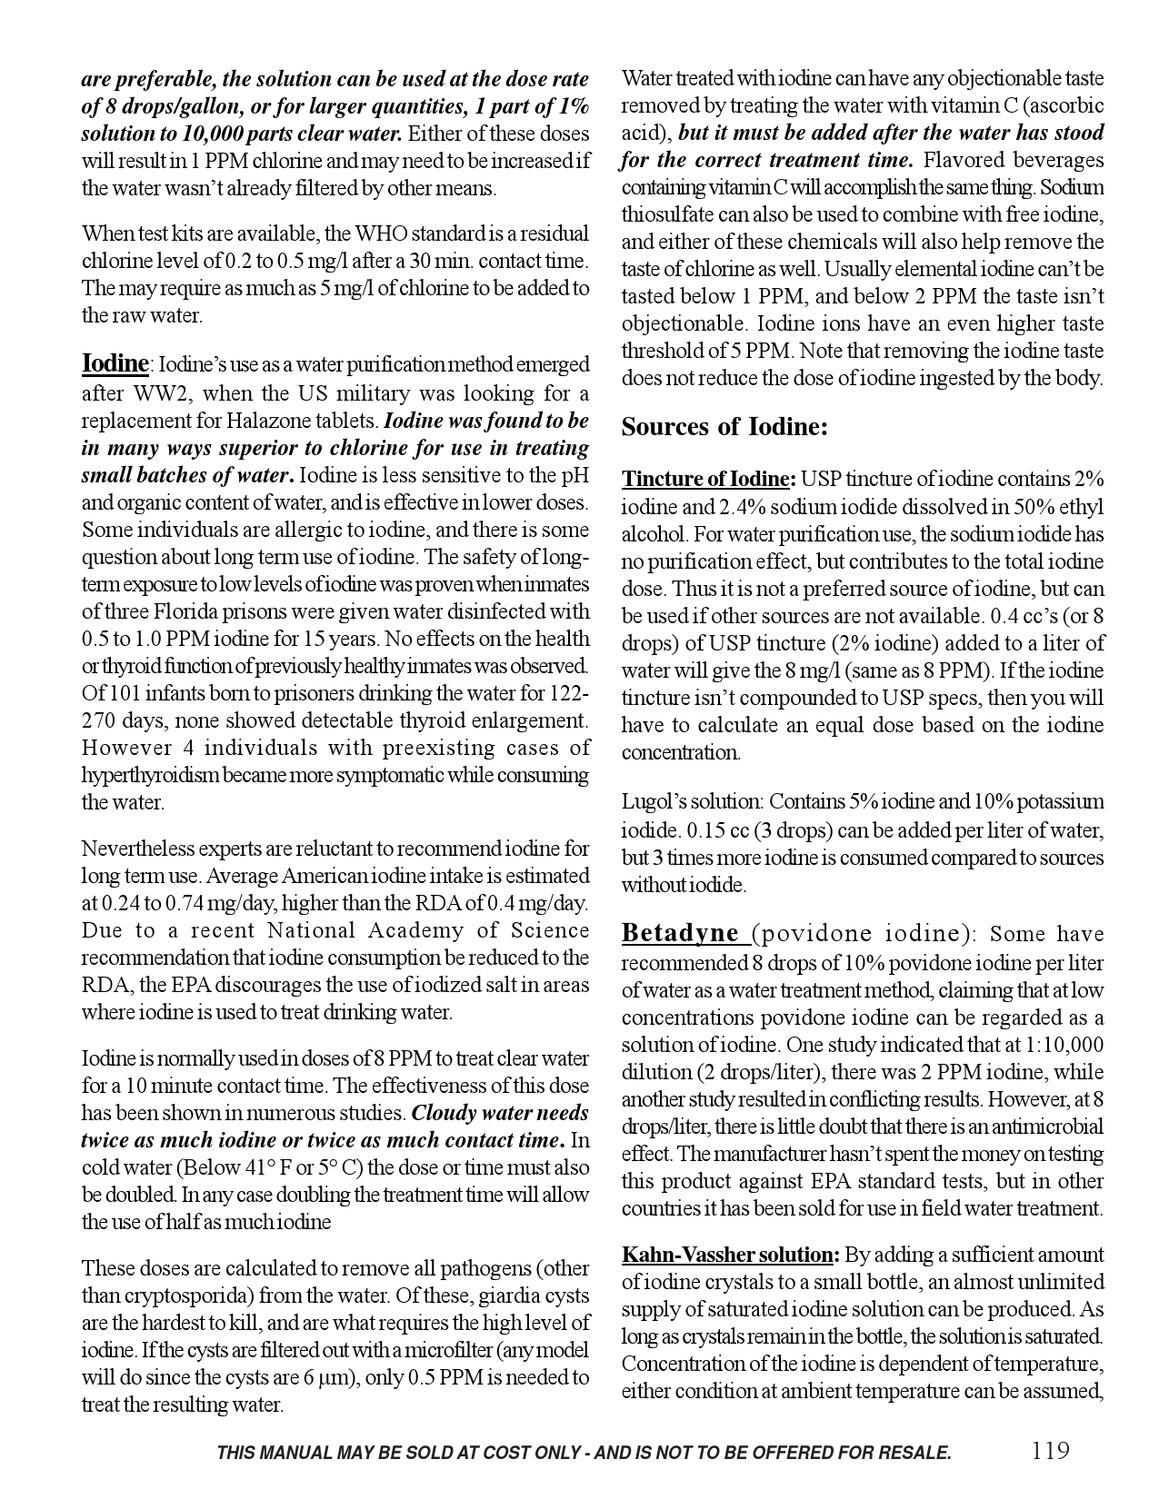 LDS Preparedness Manual by neil bigelow - issuu